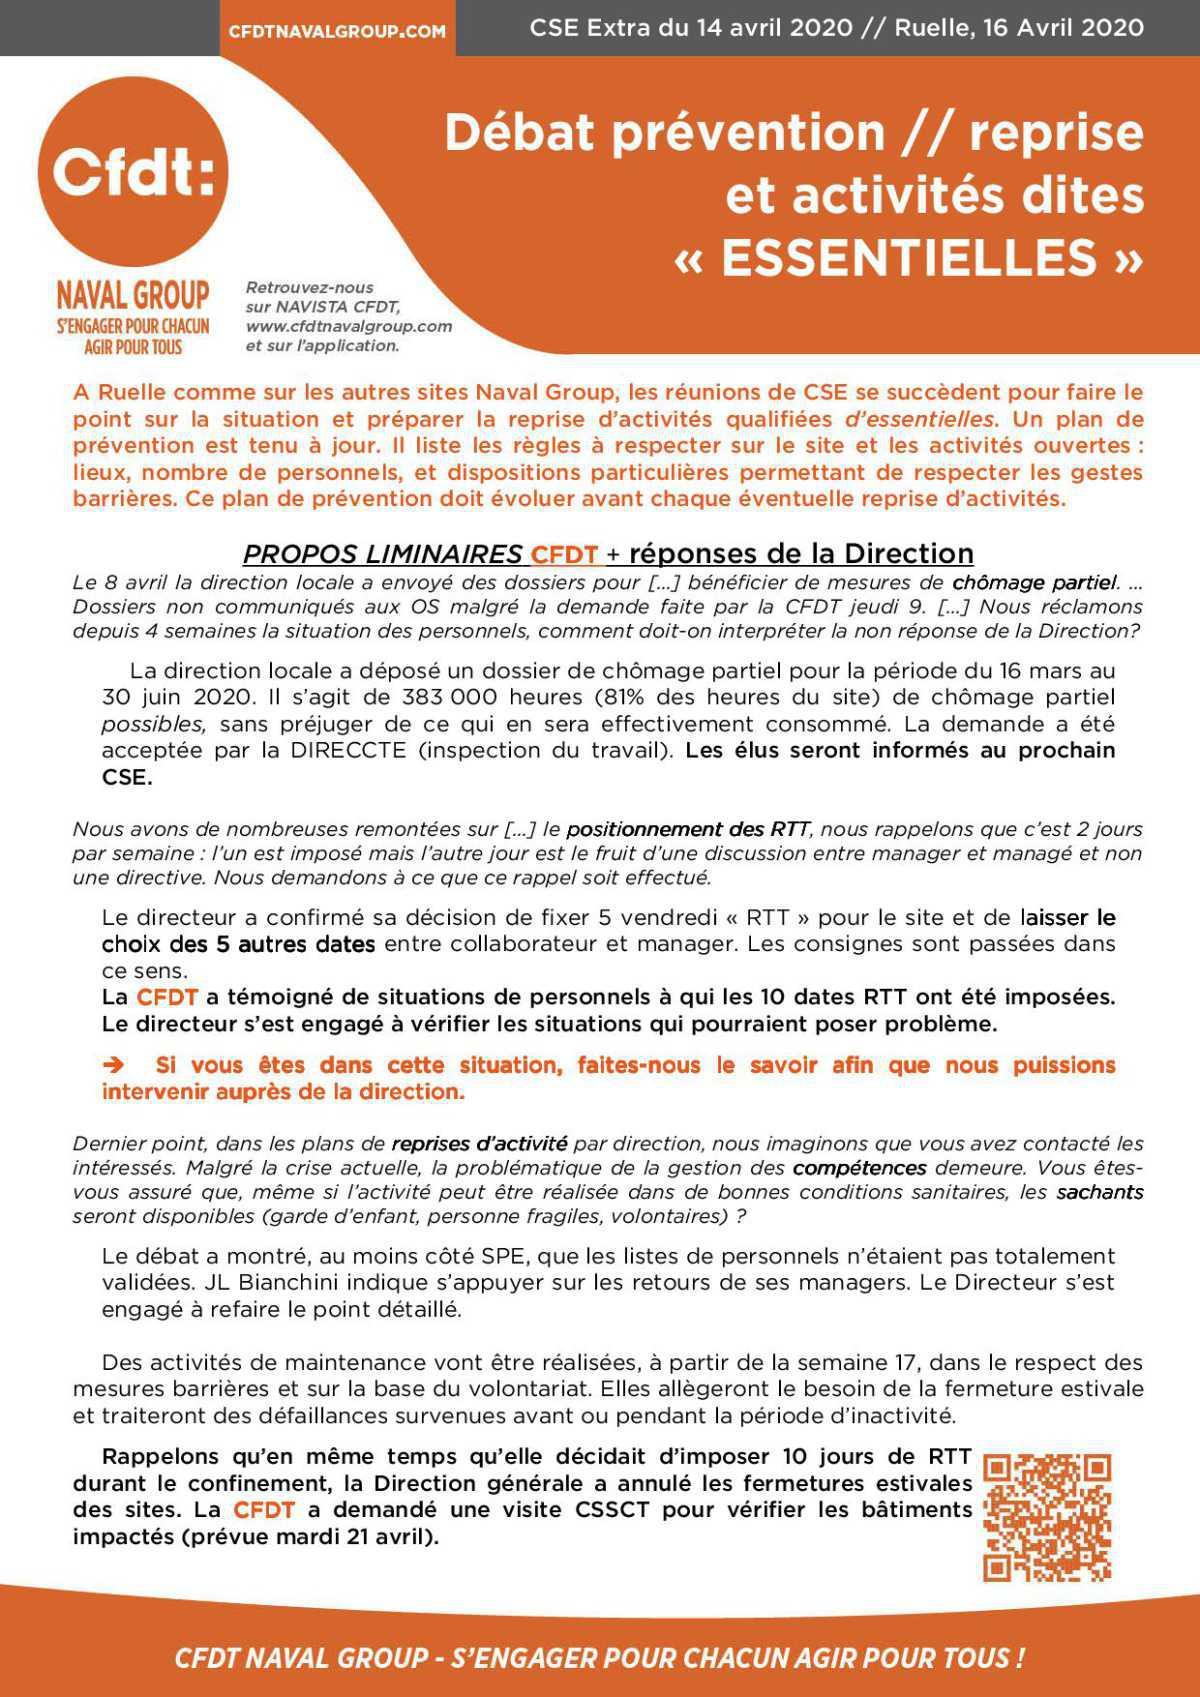 CR CSE extra de Ruelle du 14 avril 2020